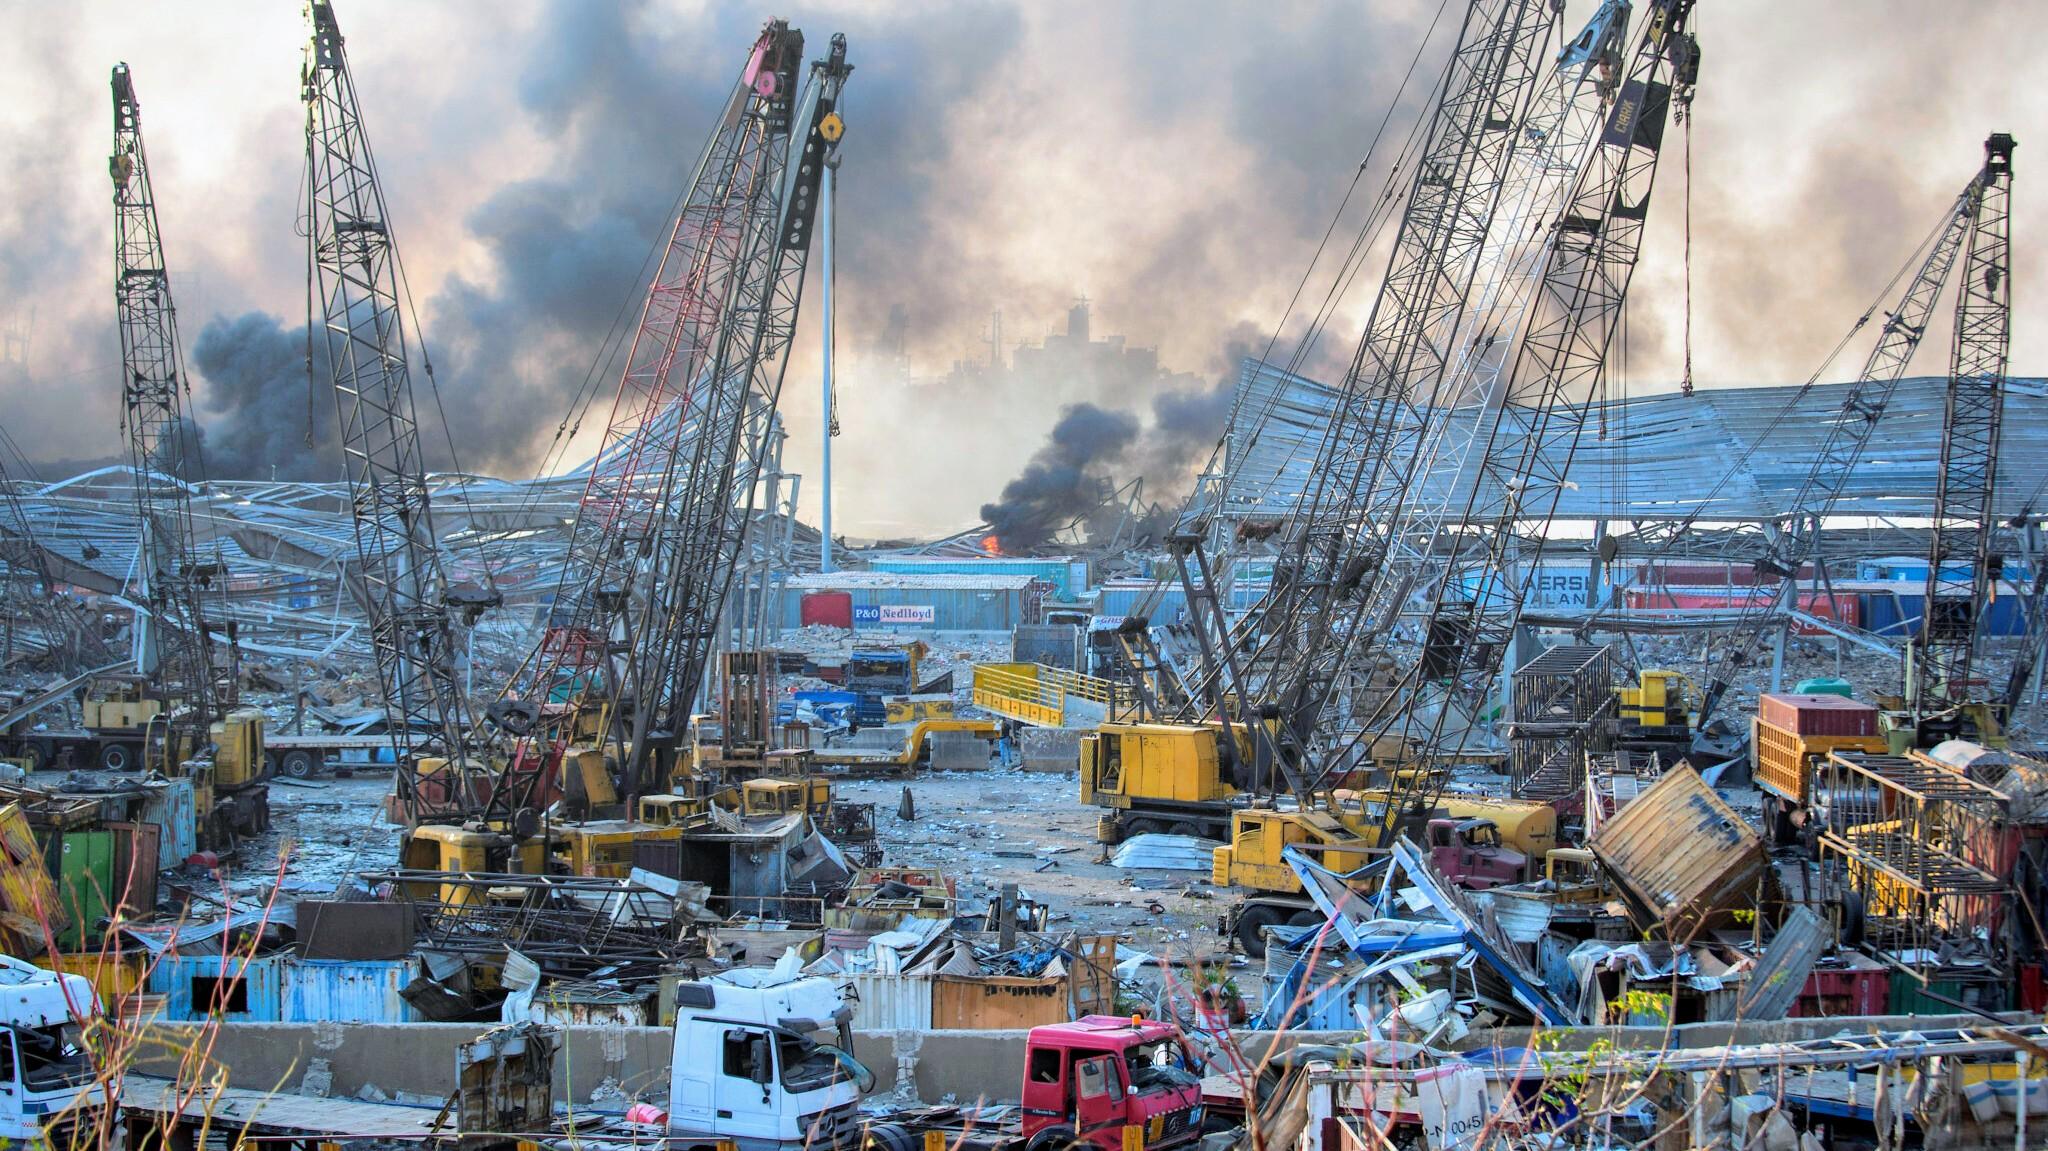 बेरुत विस्फोट : १ सय ३५ जनाको मृत्यु, नेपाली सुरक्षित